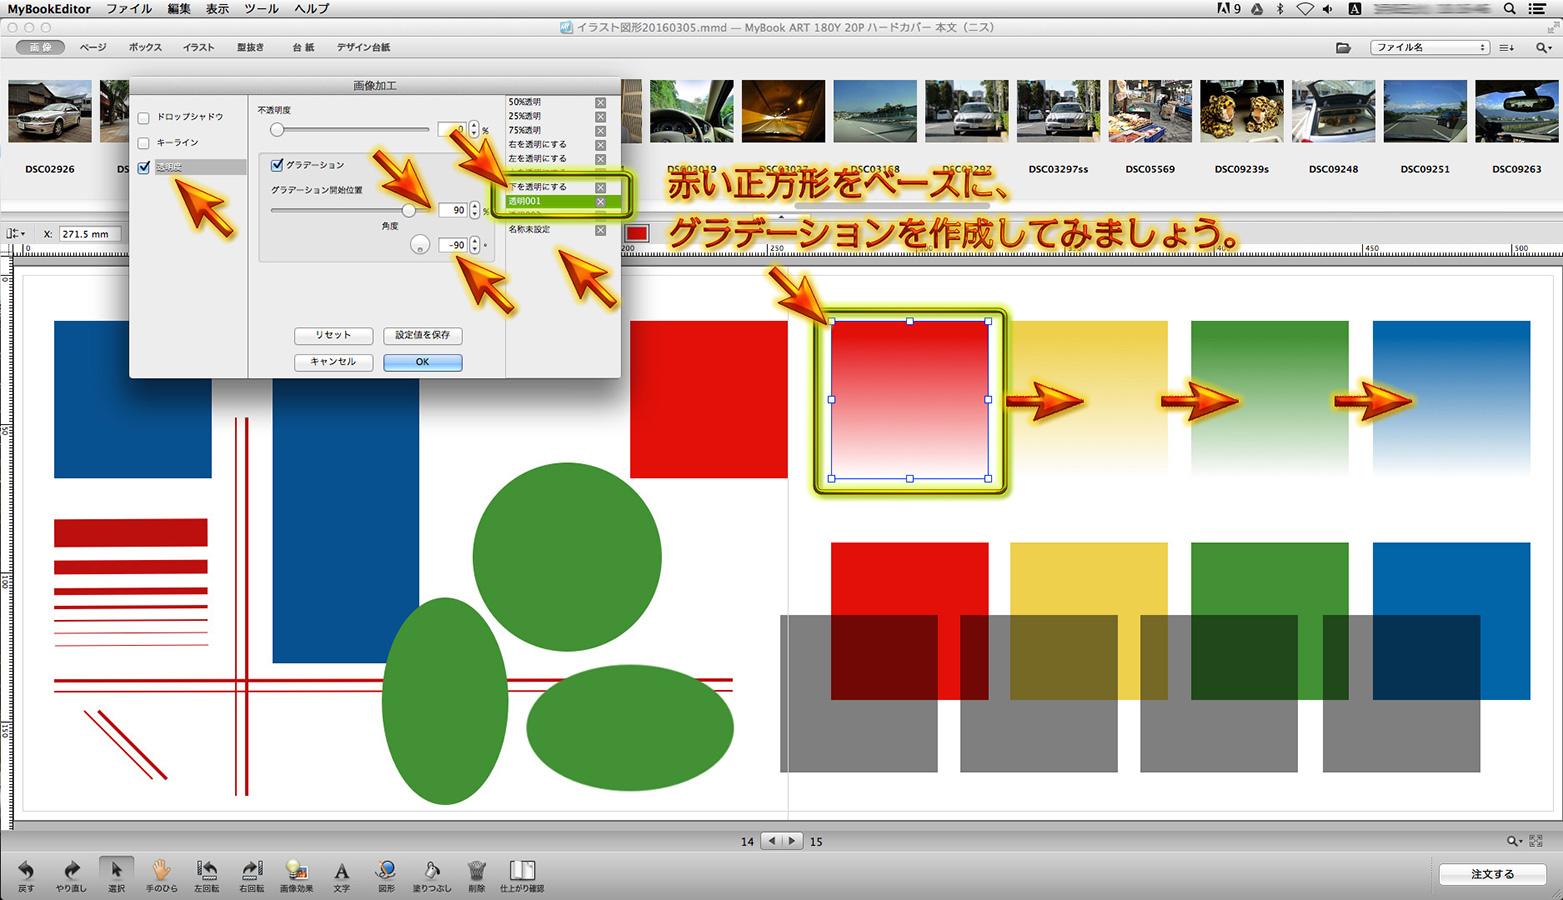 http://moritetsu.info/car/img/mb074-2016-03-08-18-16-46sssss.jpg